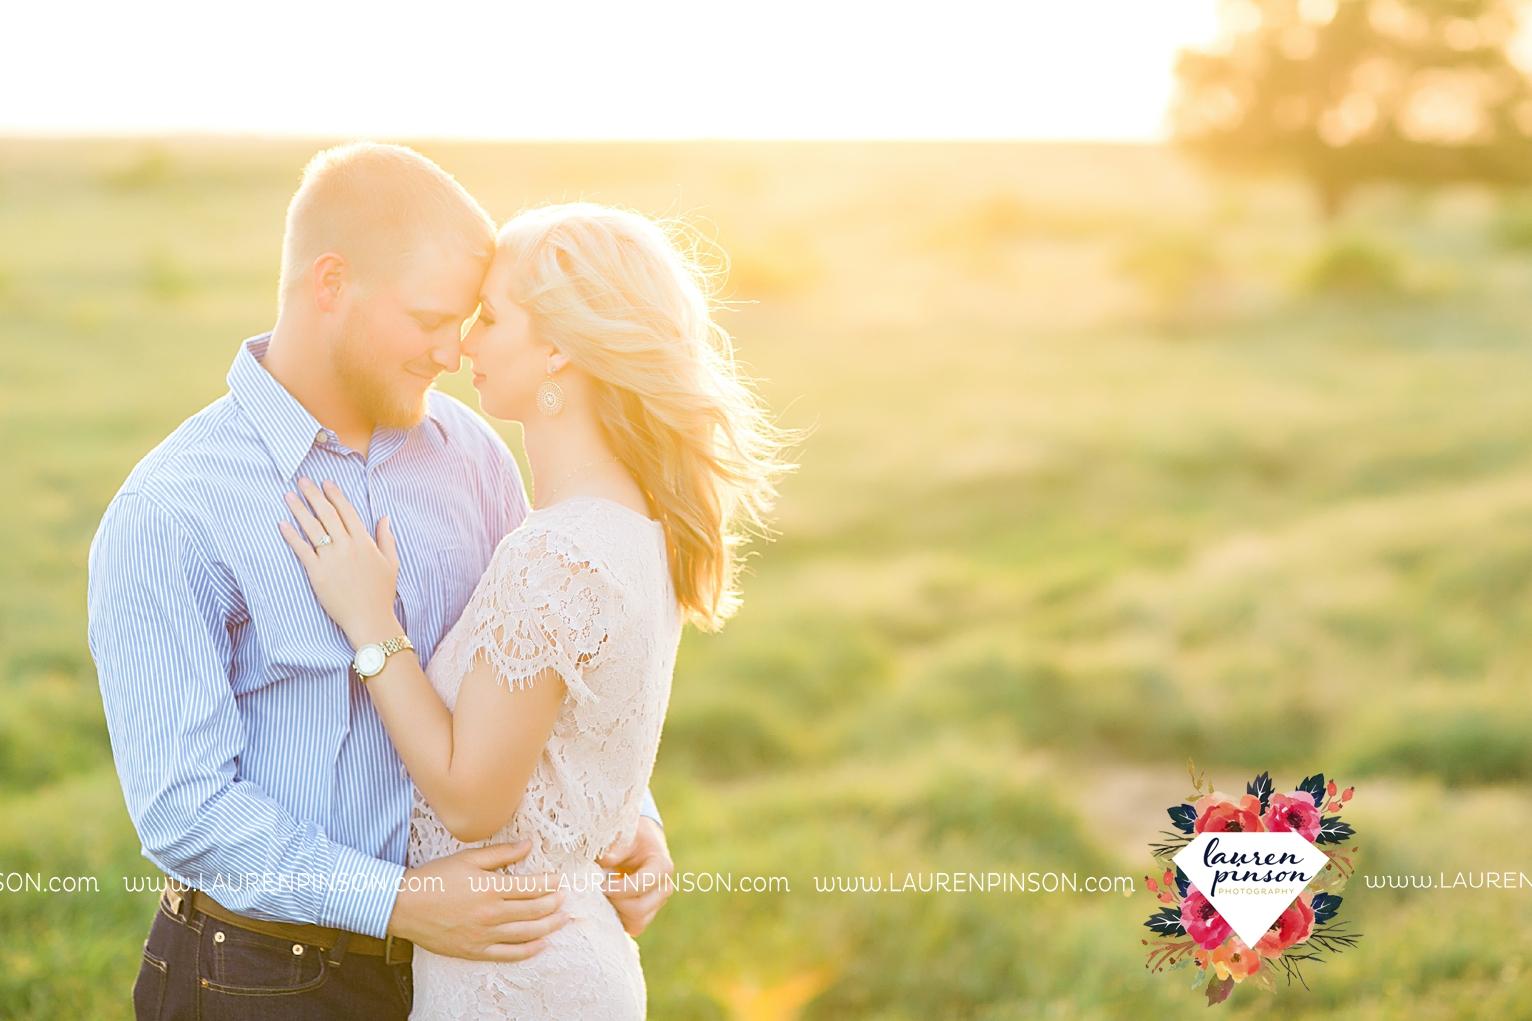 wichita-falls-texas-wedding-photographer-scotland-texas-engagement-session-country-barn-field-windthorst_2760.jpg